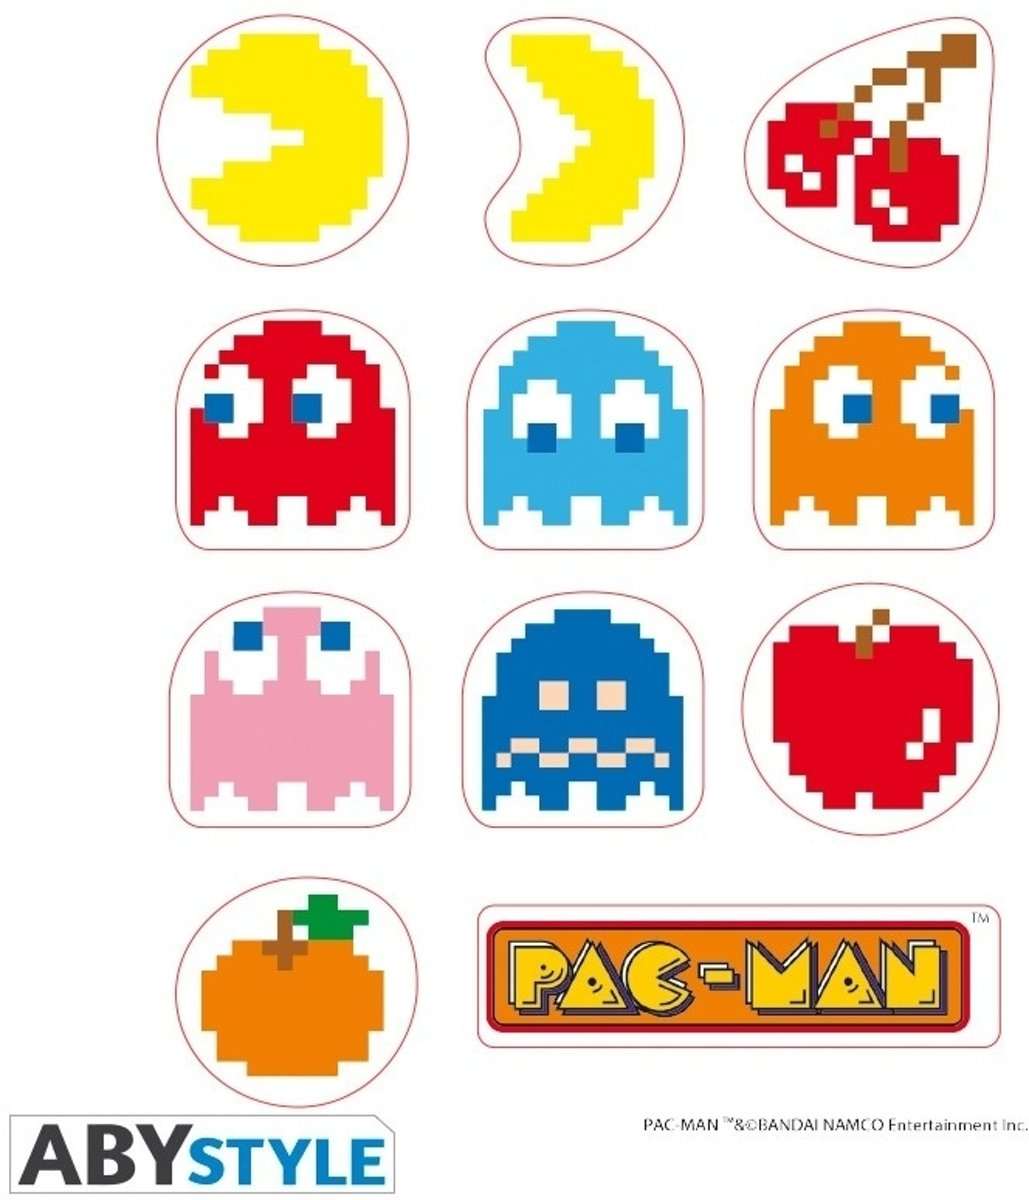 PAC-MAN - Stickers - 16x11cm/ 2 sheets - Maze X5